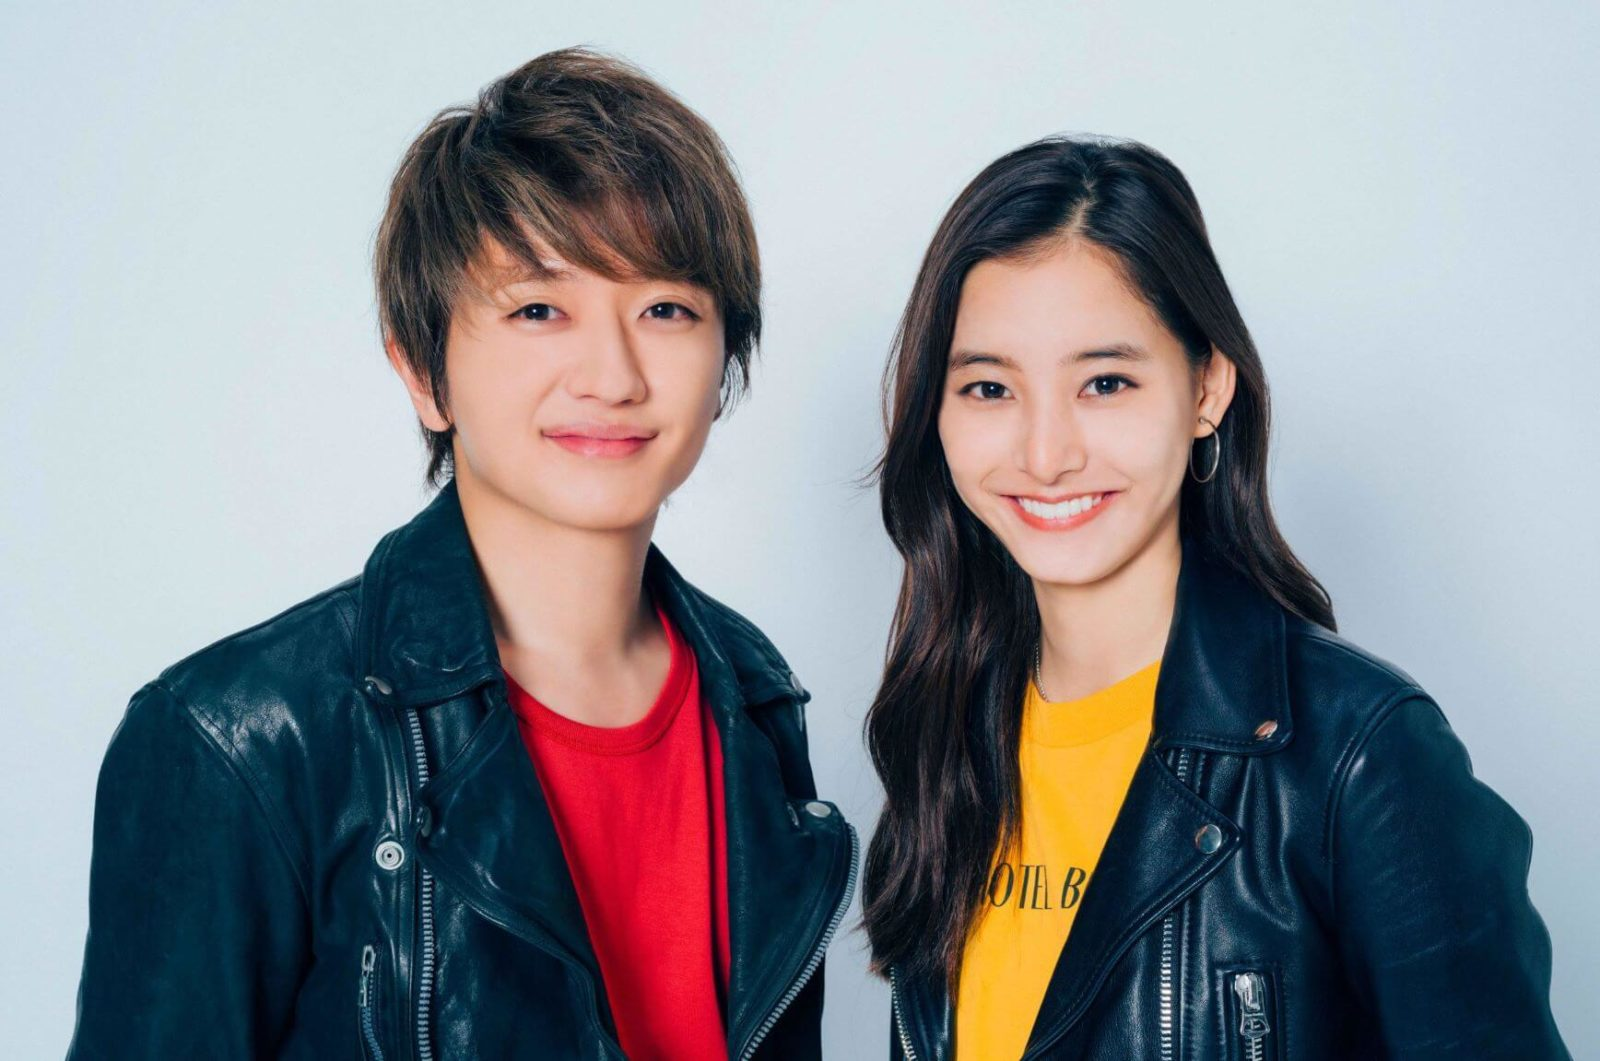 Nissy(AAA・西島隆弘)、新木優子との2ショットも公開!映画『あのコの、トリコ。』主題歌MVで共演サムネイル画像